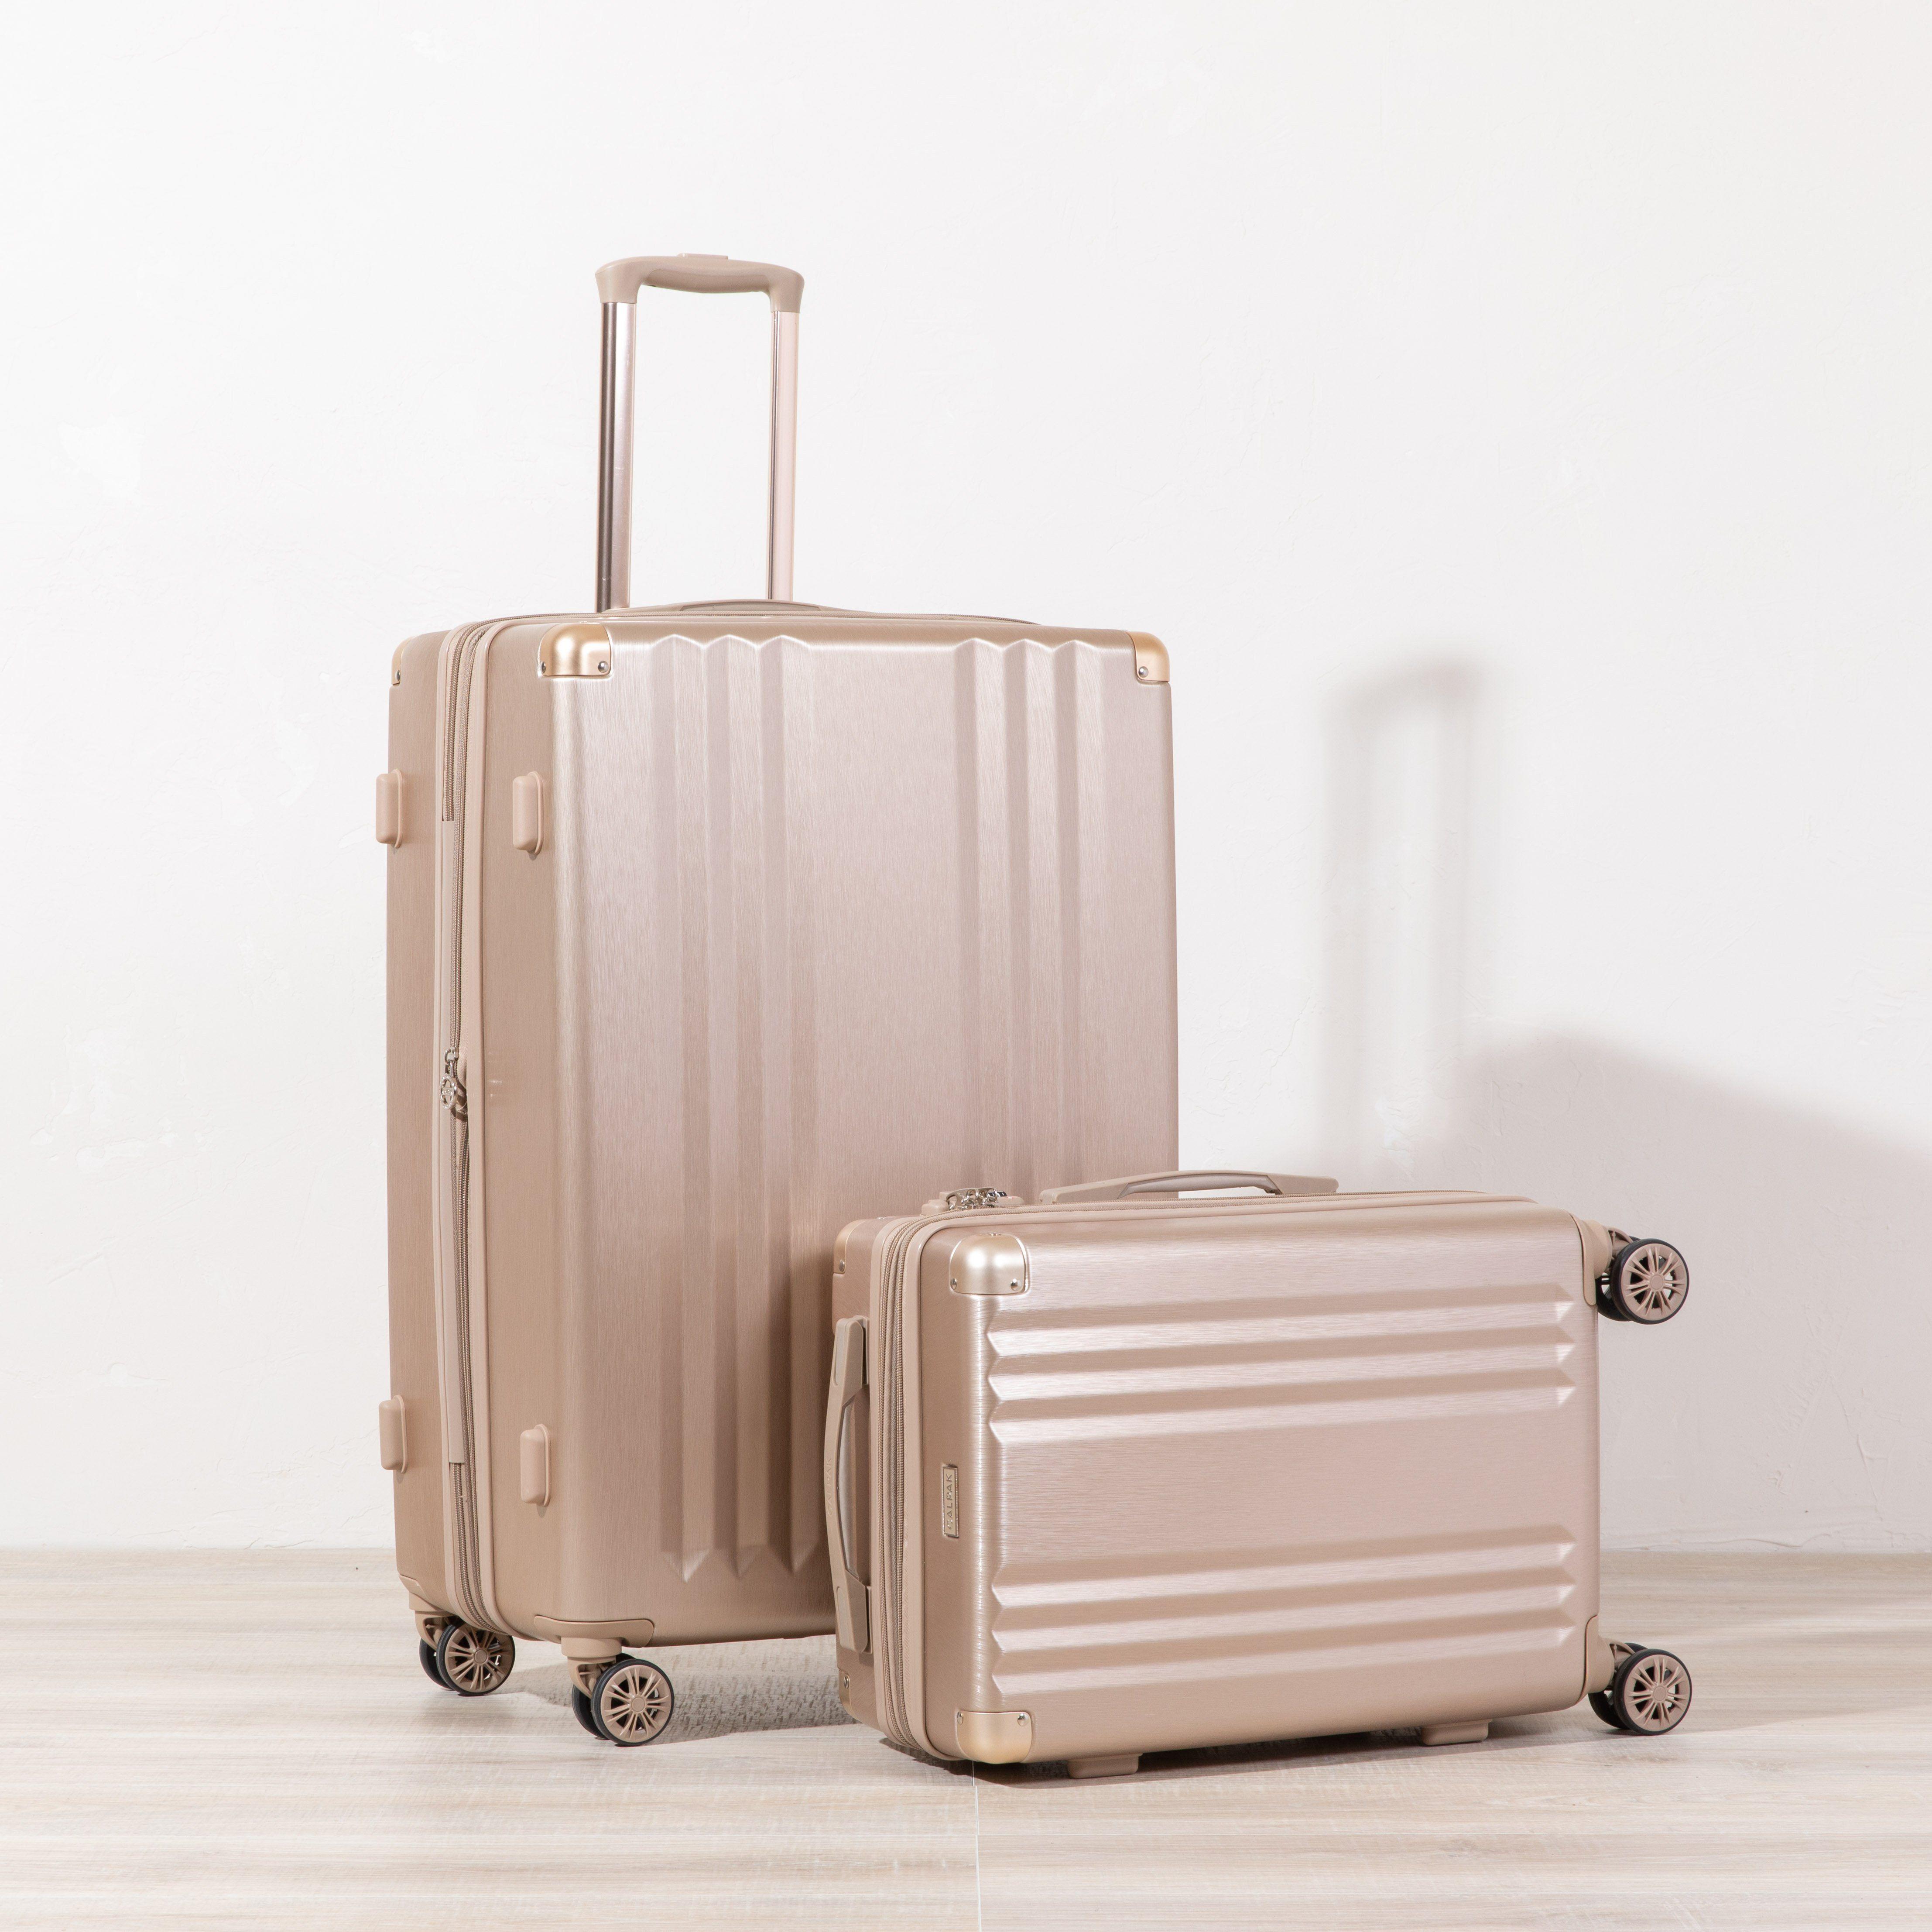 97eb08c71 Ambeur 2-Piece Luggage Set - Gold